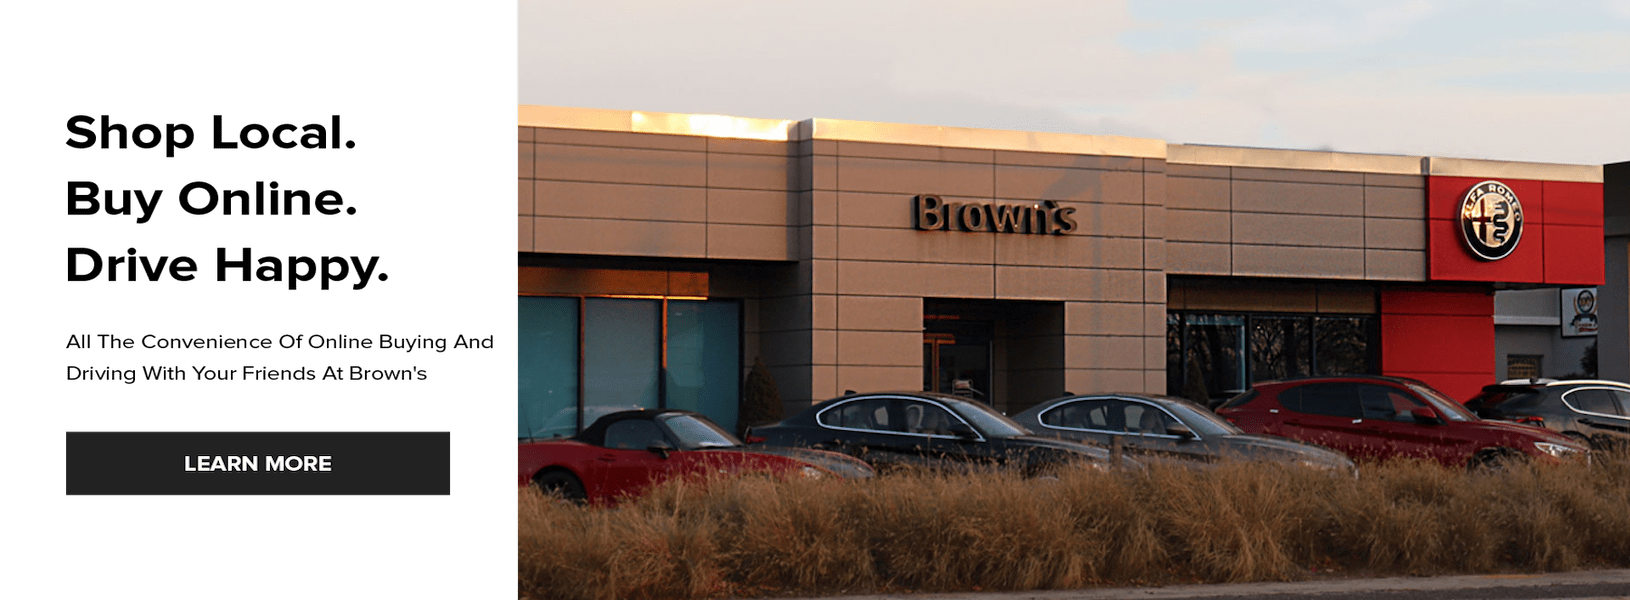 Alfa-Shop-Local_Drive-Happy-Slider-Browns